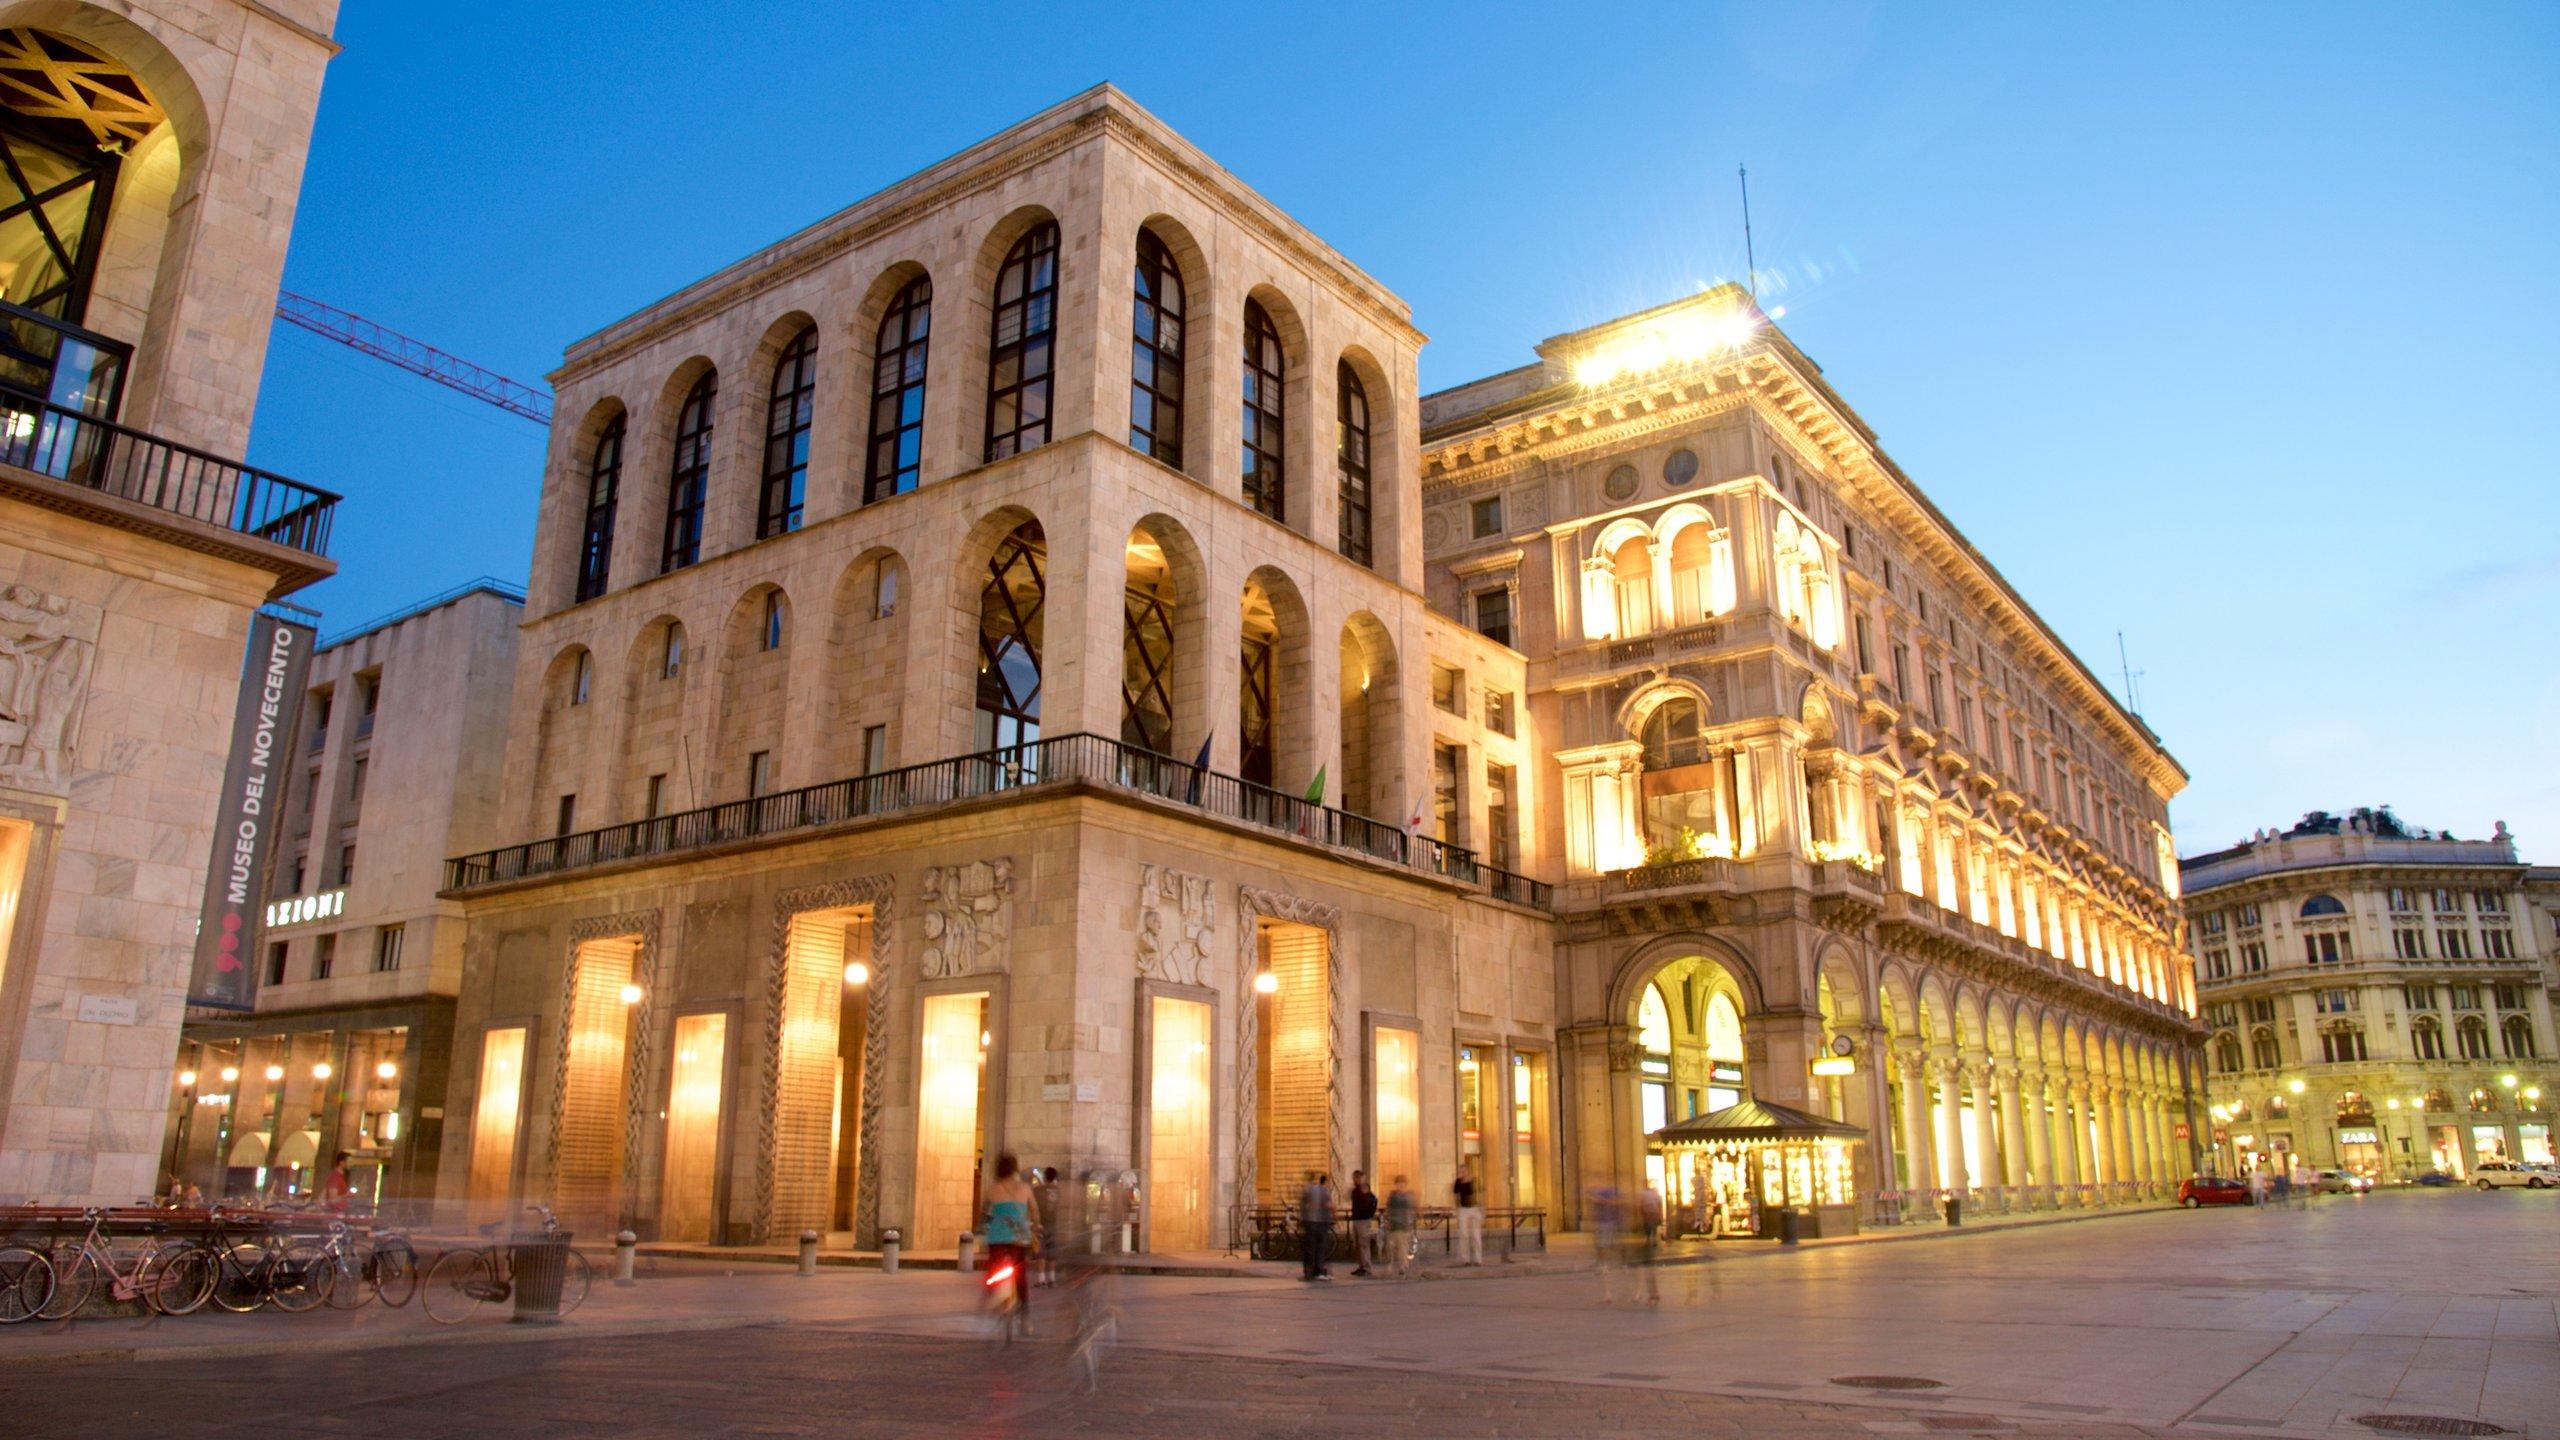 Hotel Mailand Gunstig Buchen Hotels Expedia De